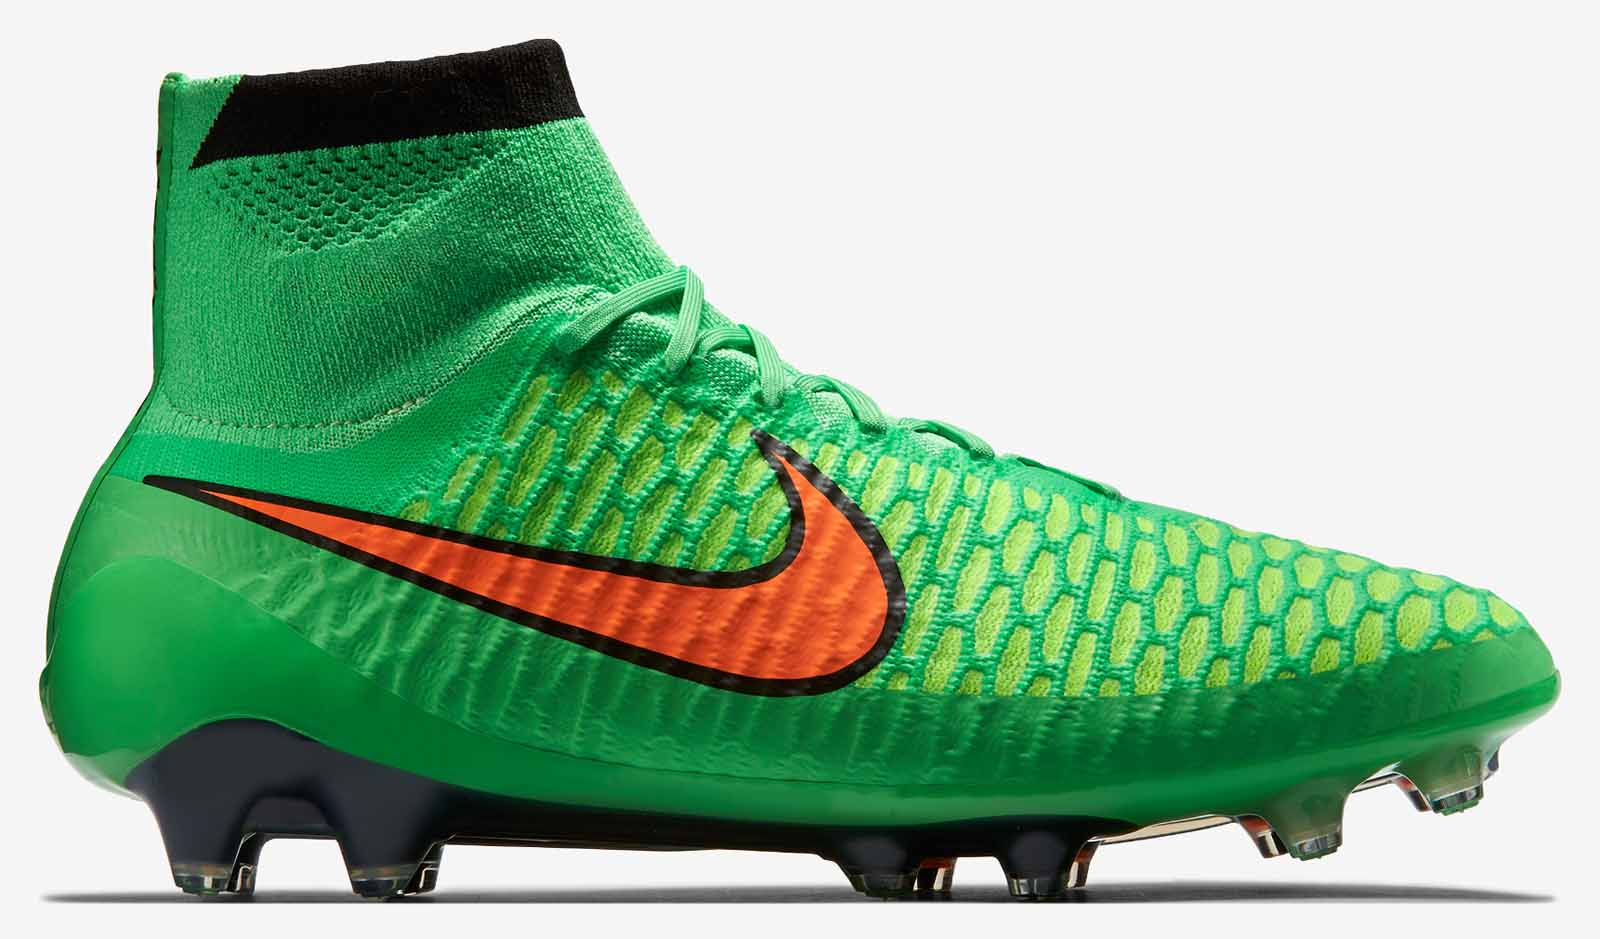 a6009aafffaa get 70 nike magista opus ii fg soccer cleats white green black 128e6 f791a;  low price nike magista soccer cleats green and orange 17ab3 bf99d